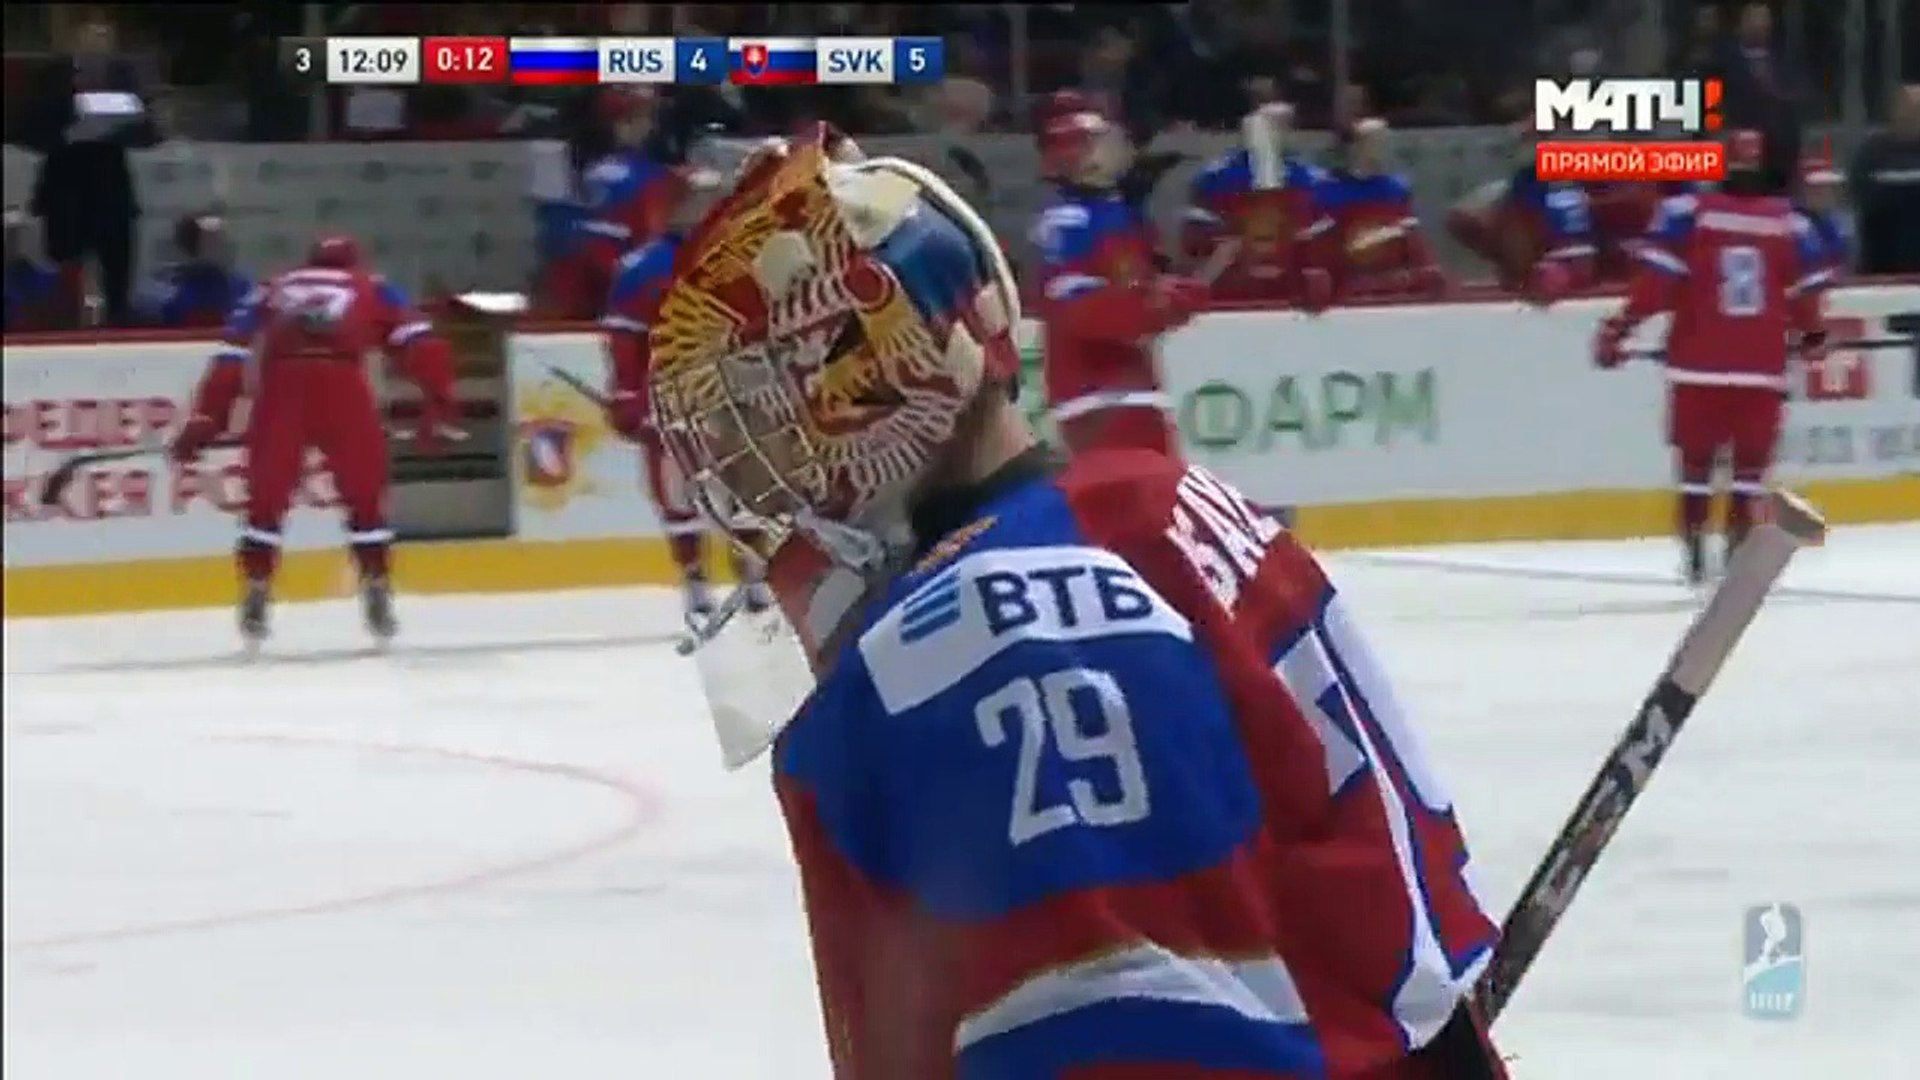 Michal Mrazik goal vs Russia